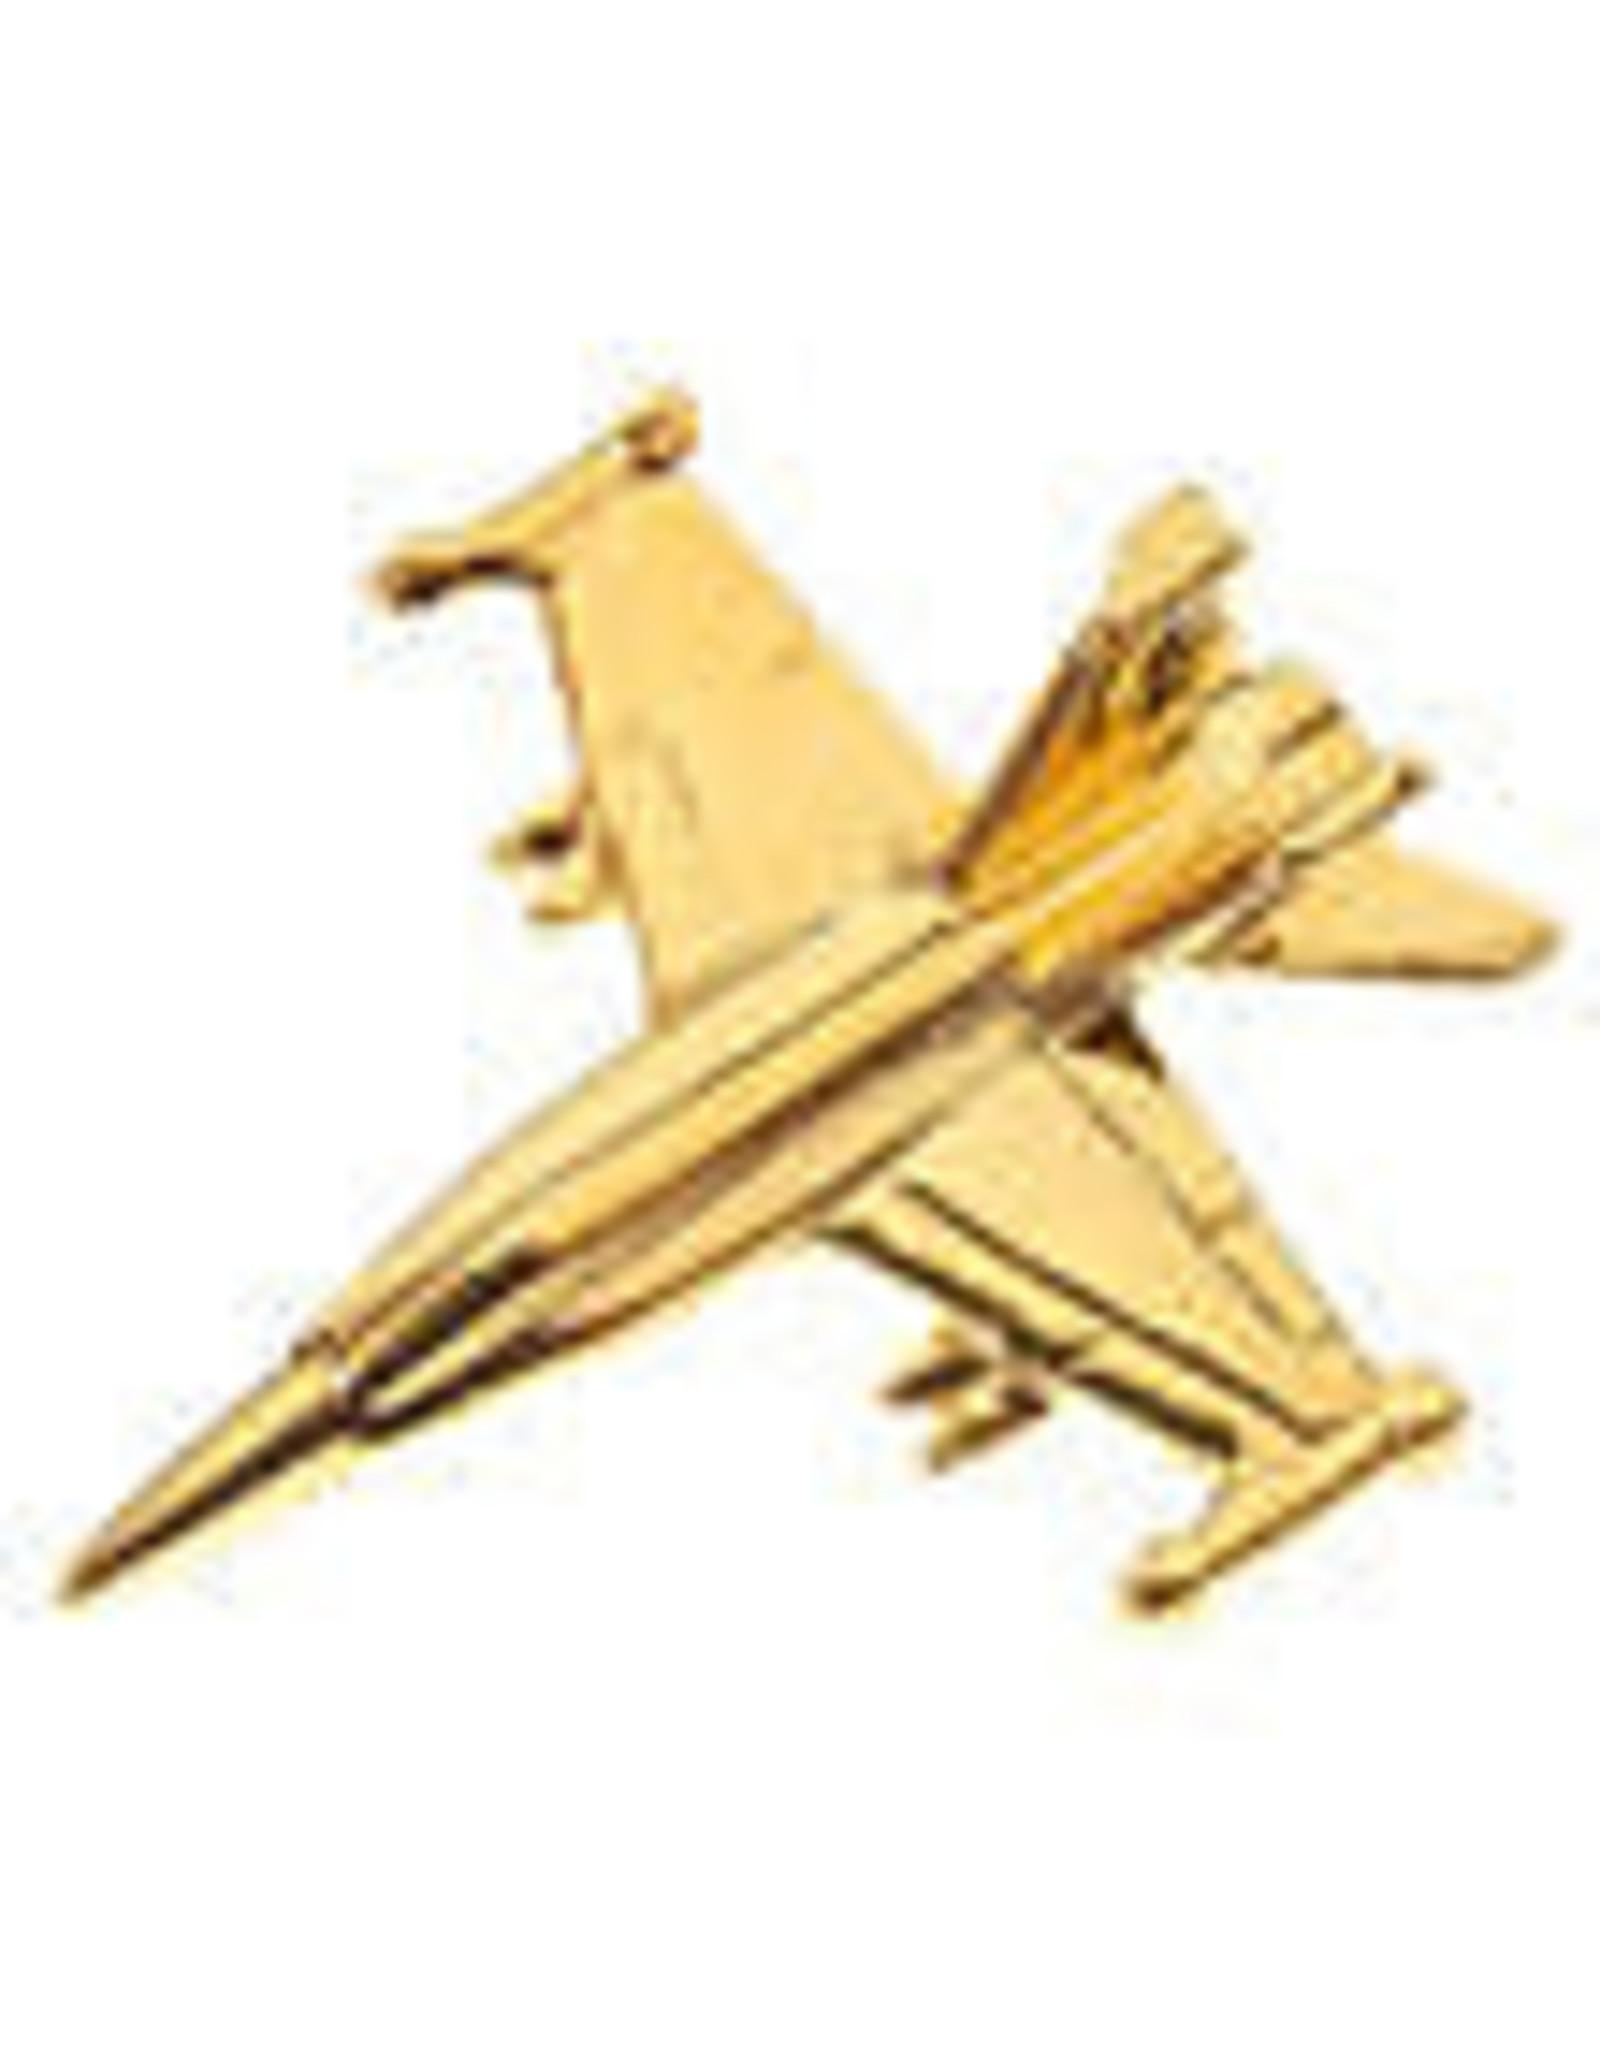 Clivedon Pin Badge FA-18 Hornet, Pin, gold